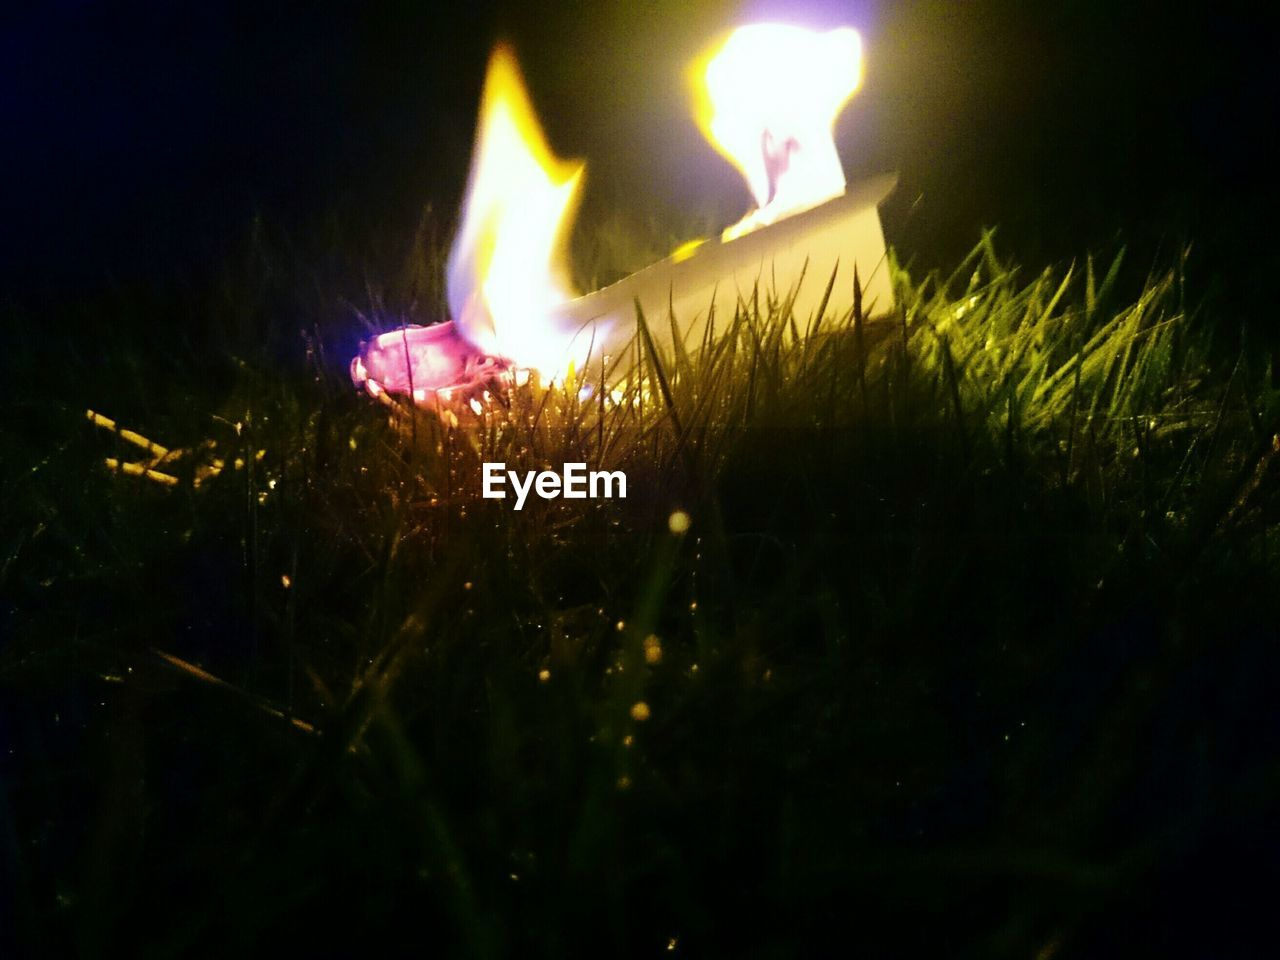 burning, night, flame, glowing, illuminated, celebration, heat - temperature, no people, selective focus, close-up, outdoors, diwali, diya - oil lamp, grass